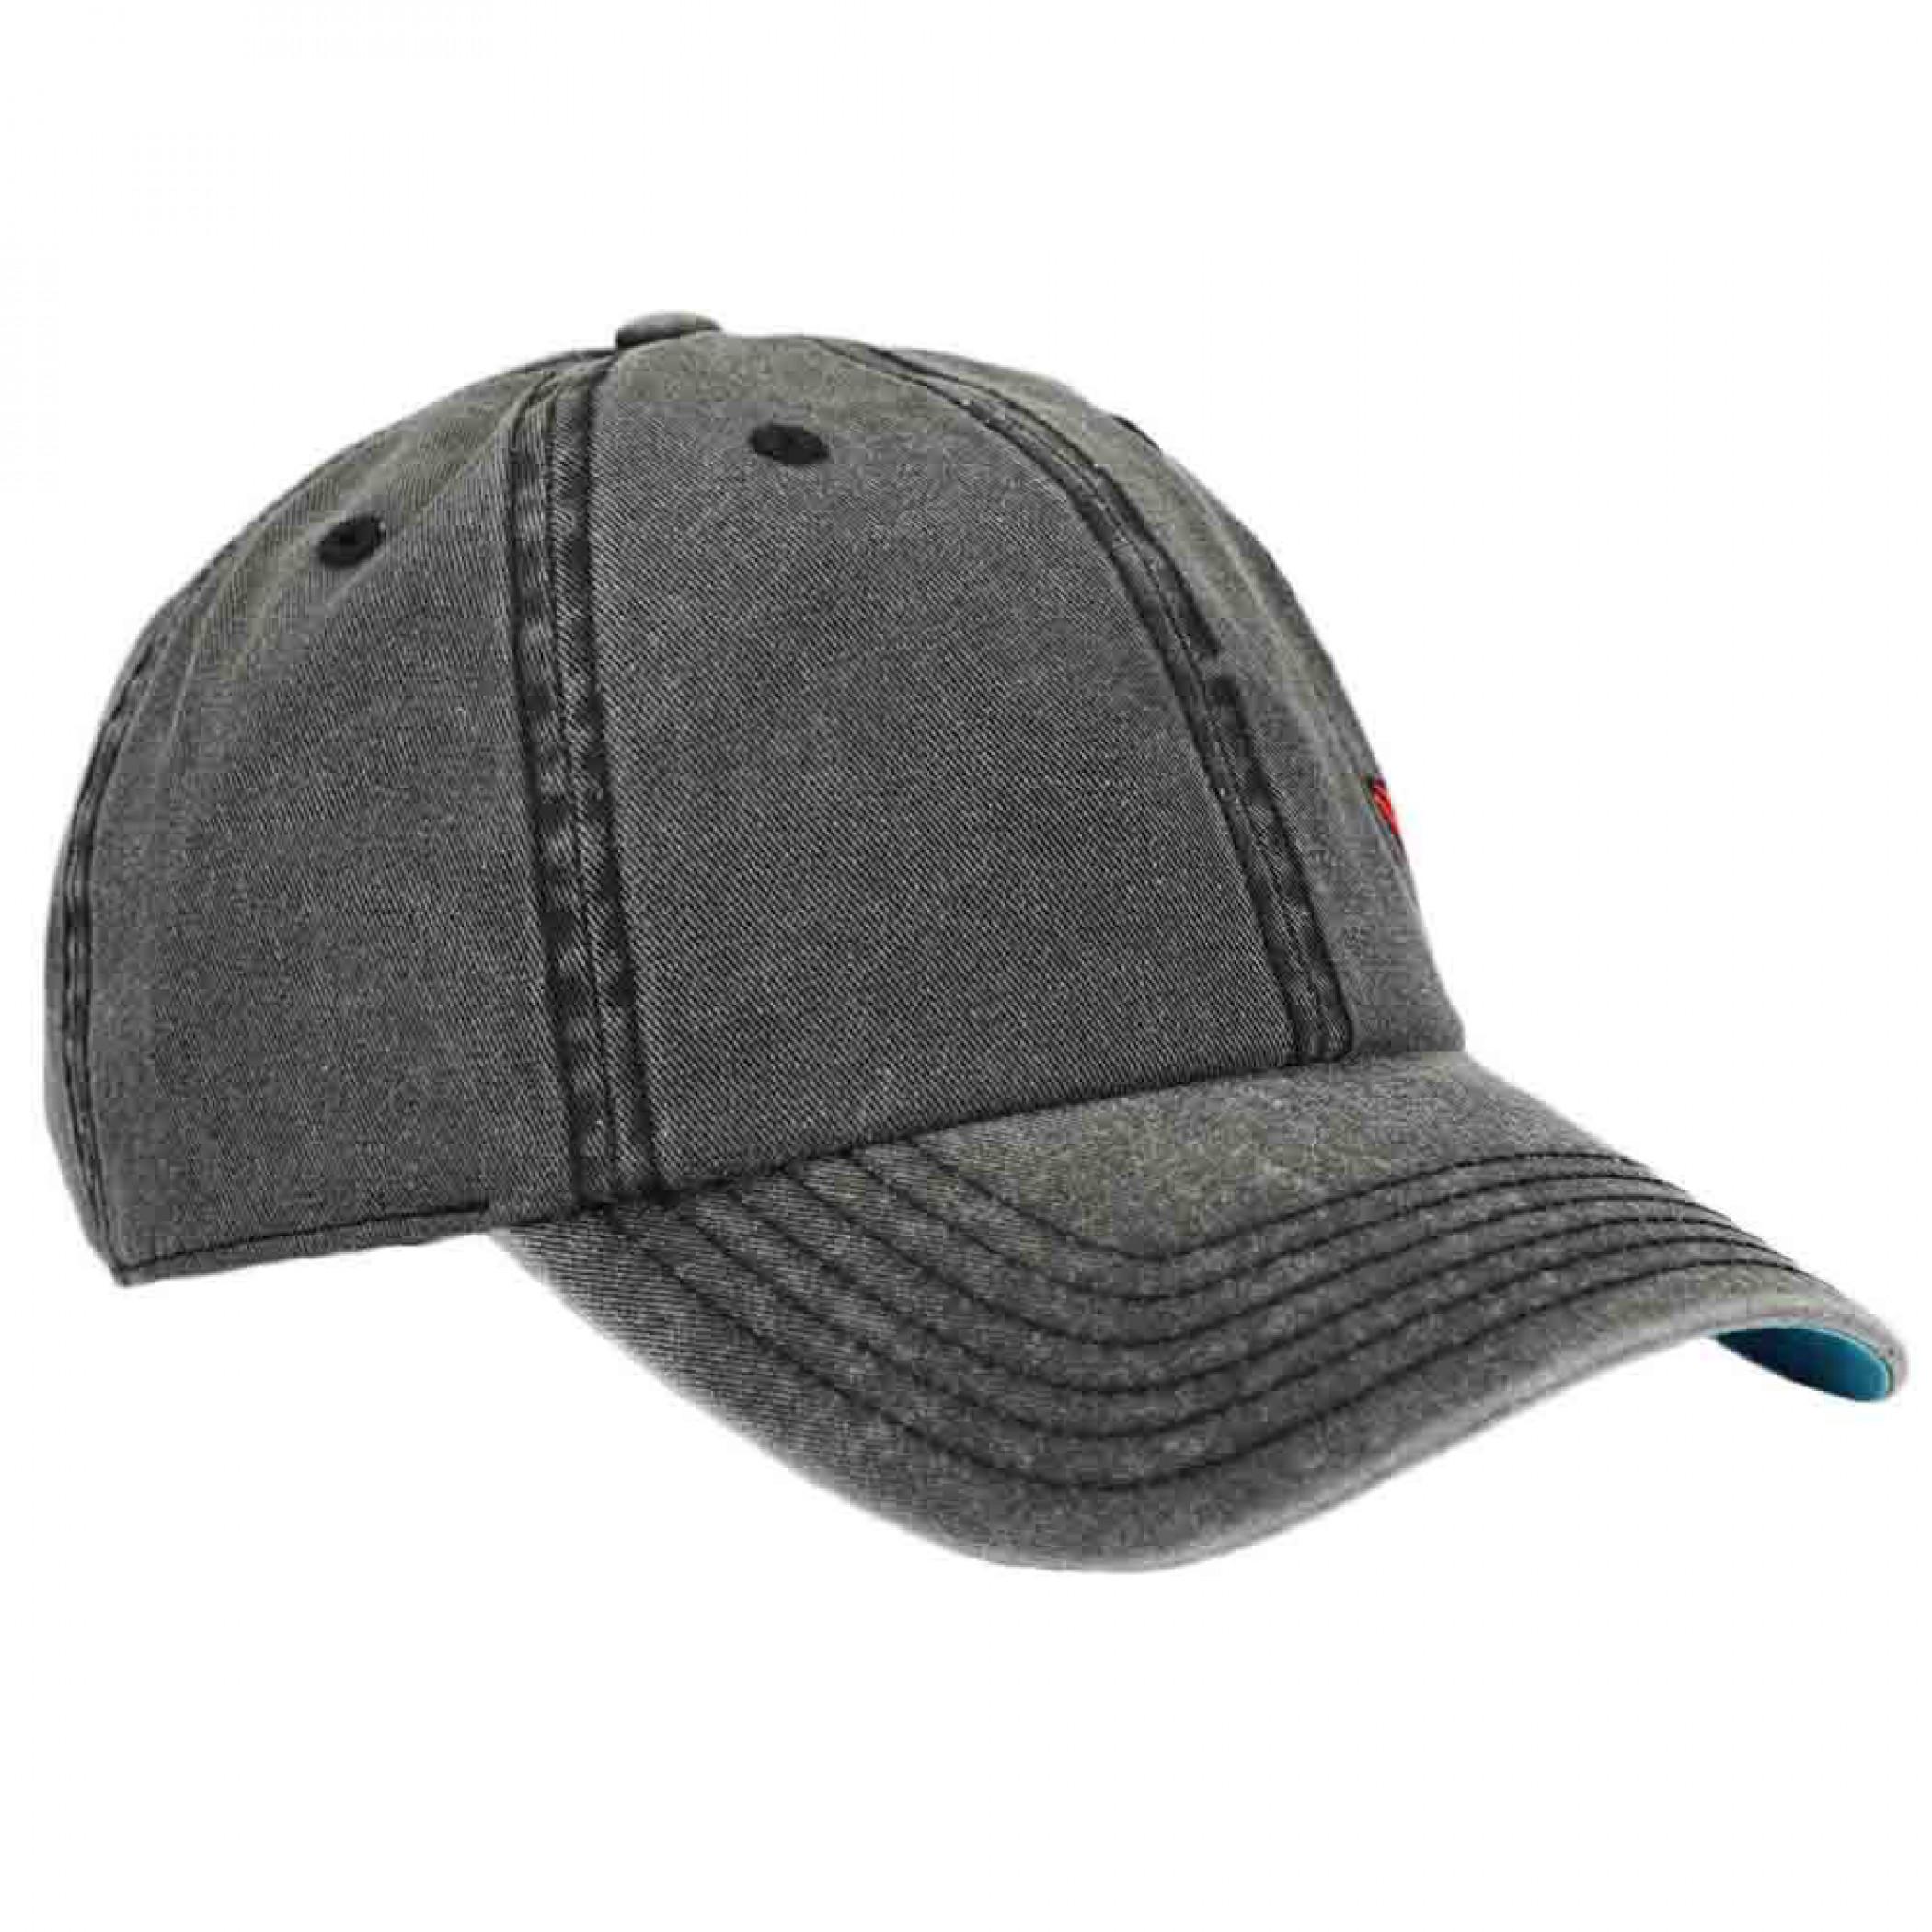 SEGA Sonic The Hedgehog Running Character Dye Side Art Adjustable Hat